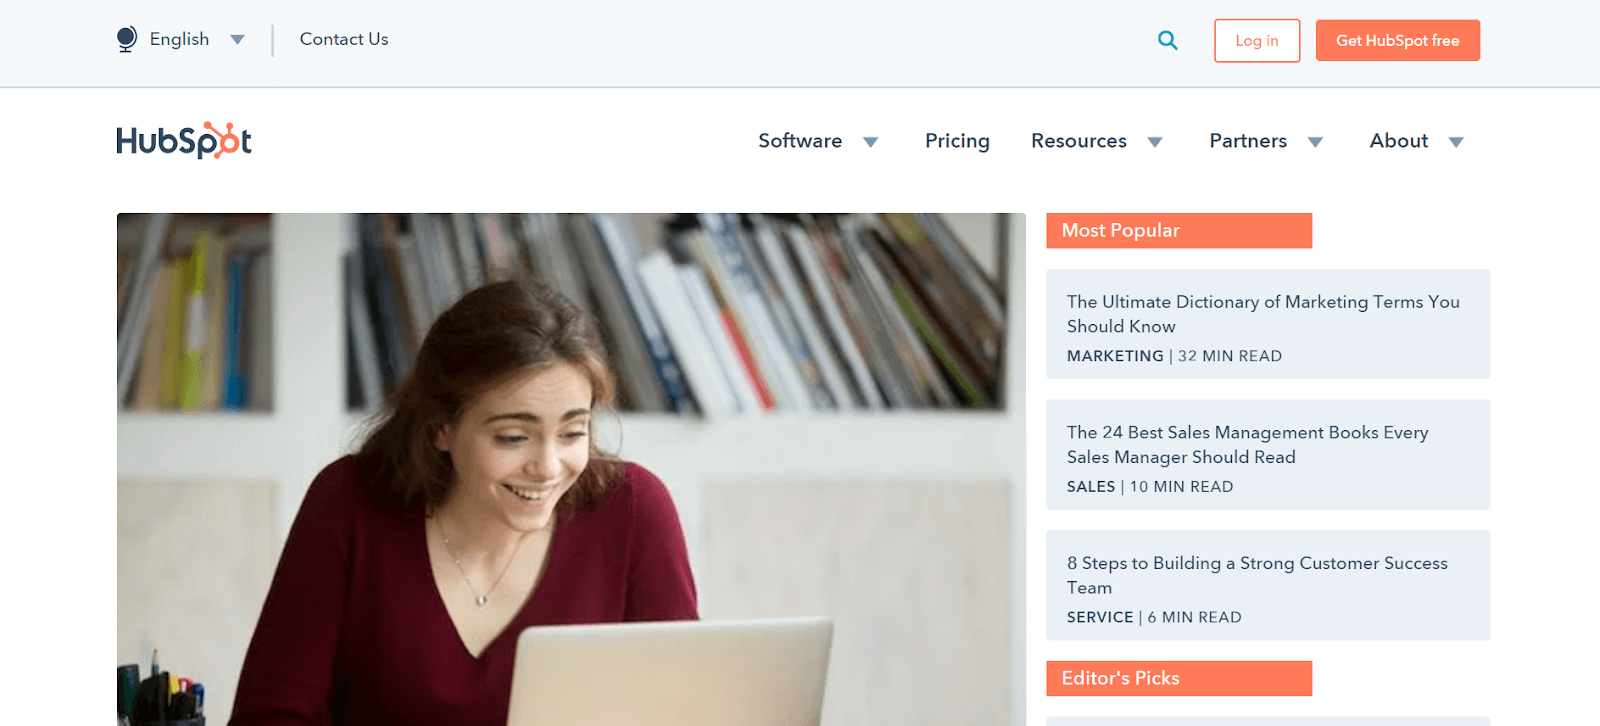 HubSpot Content Marketing Examples